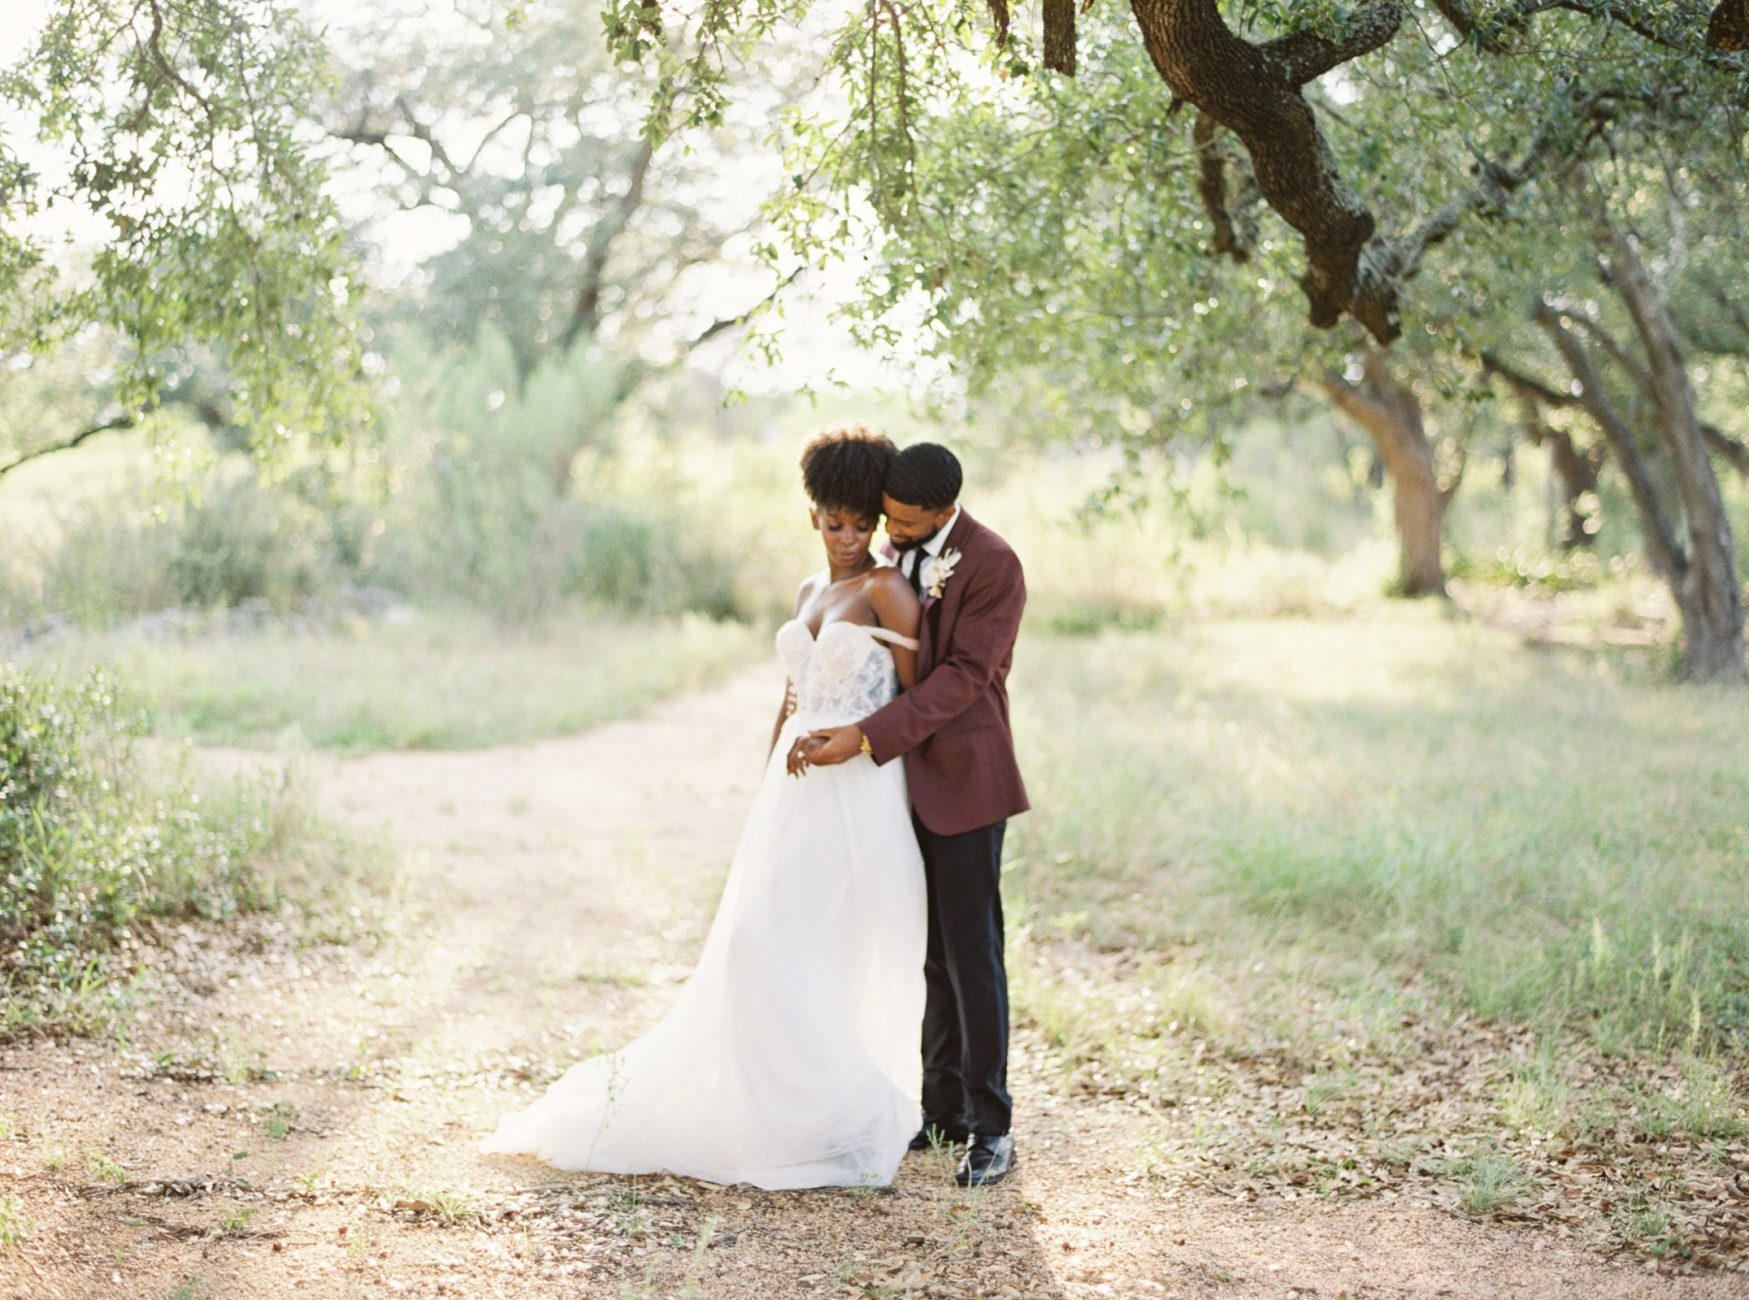 Bride and Groom embracing under oak tree at Prospect House Wedding Venue